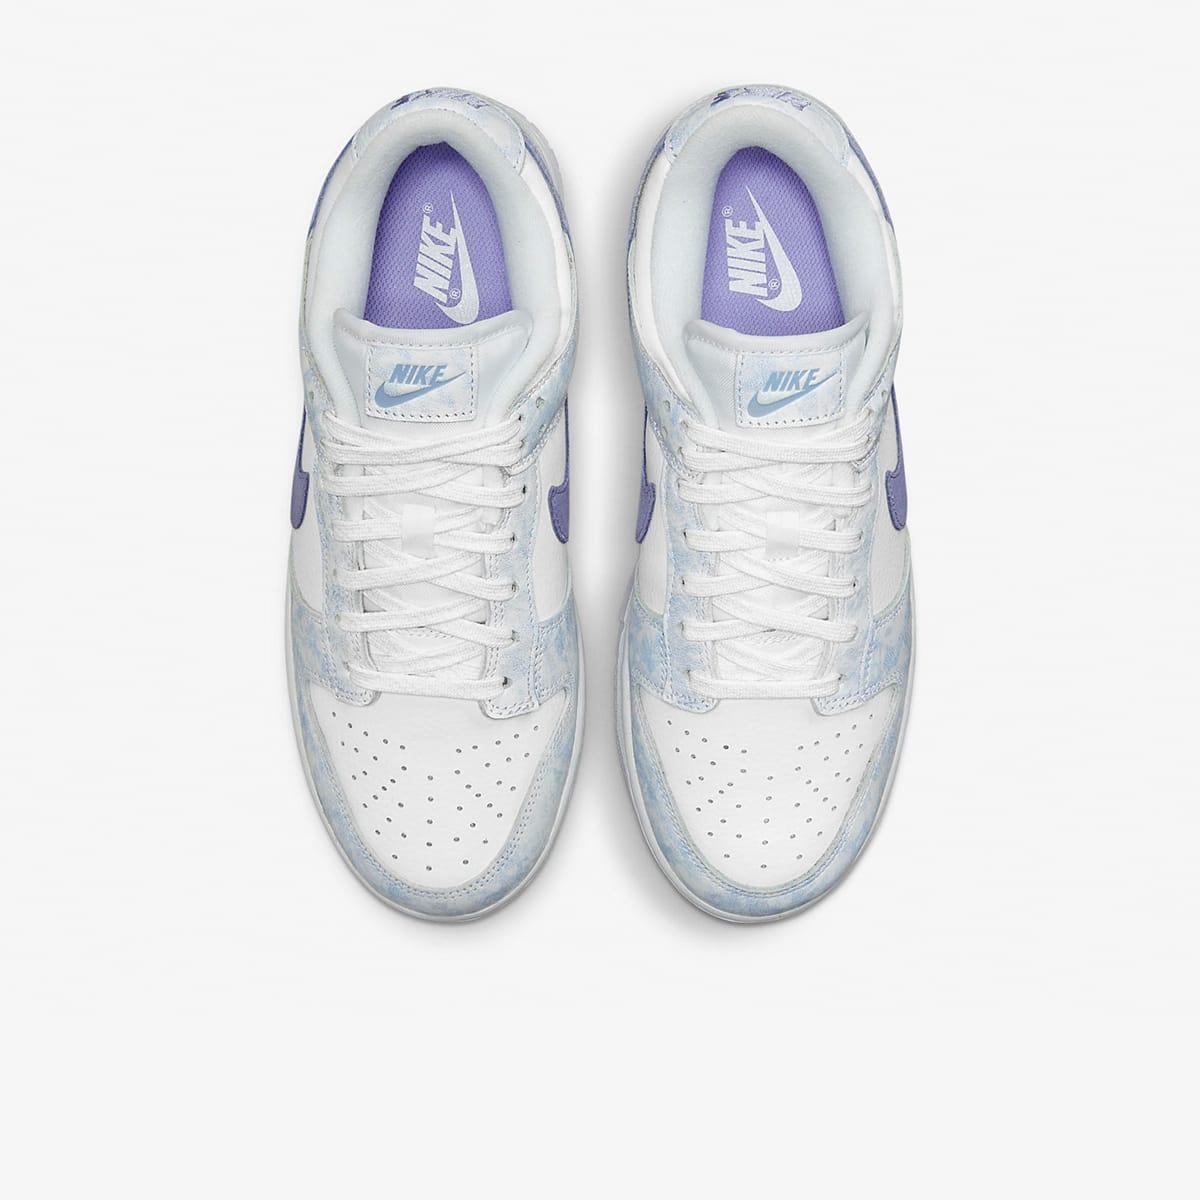 Nike Dunk Low OG W - DM9467-500